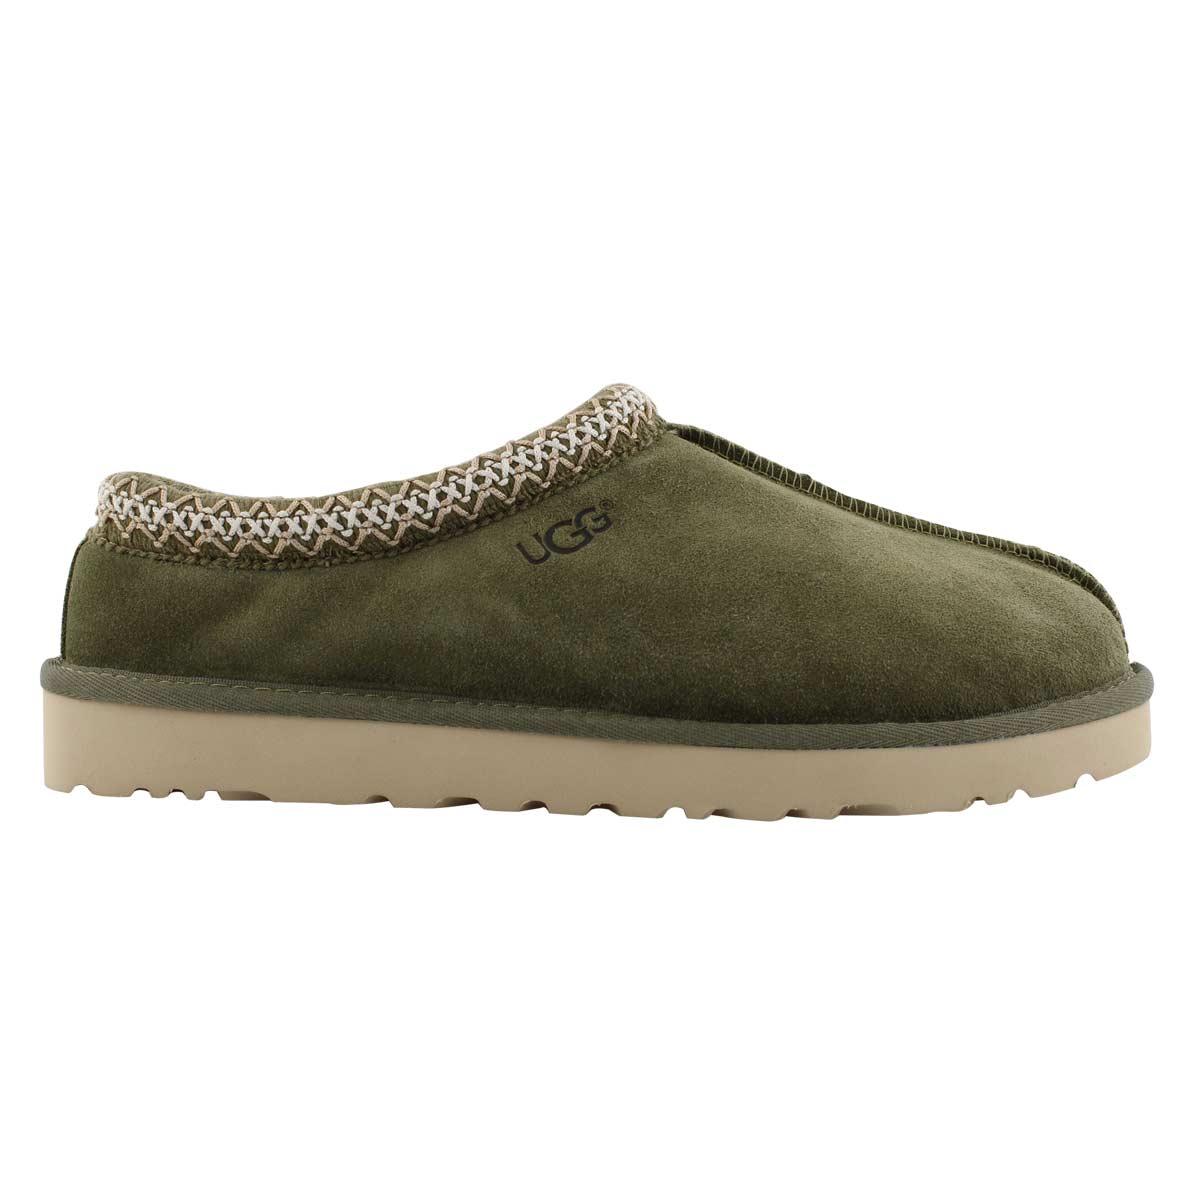 Mns Tasman moss green sheepskin slipper